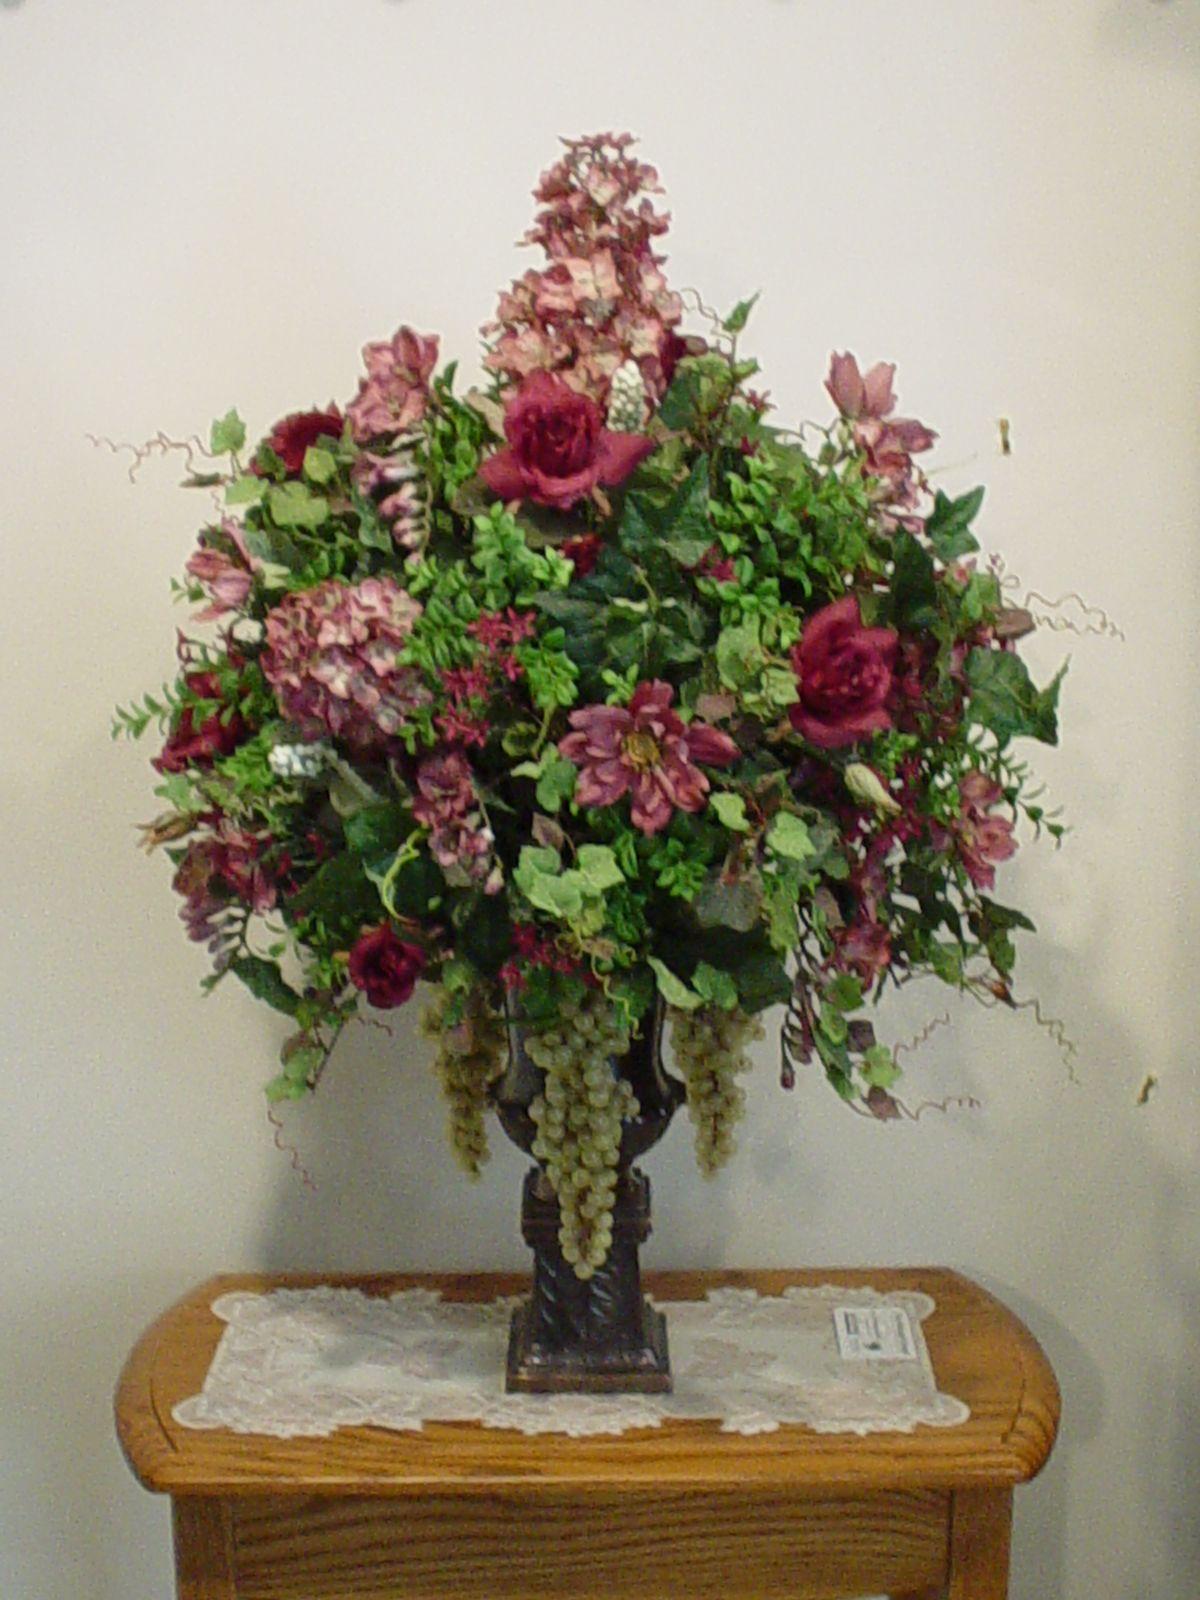 Artificial Flower Arrangements 1200x1600 Floral Arrangement Kootation